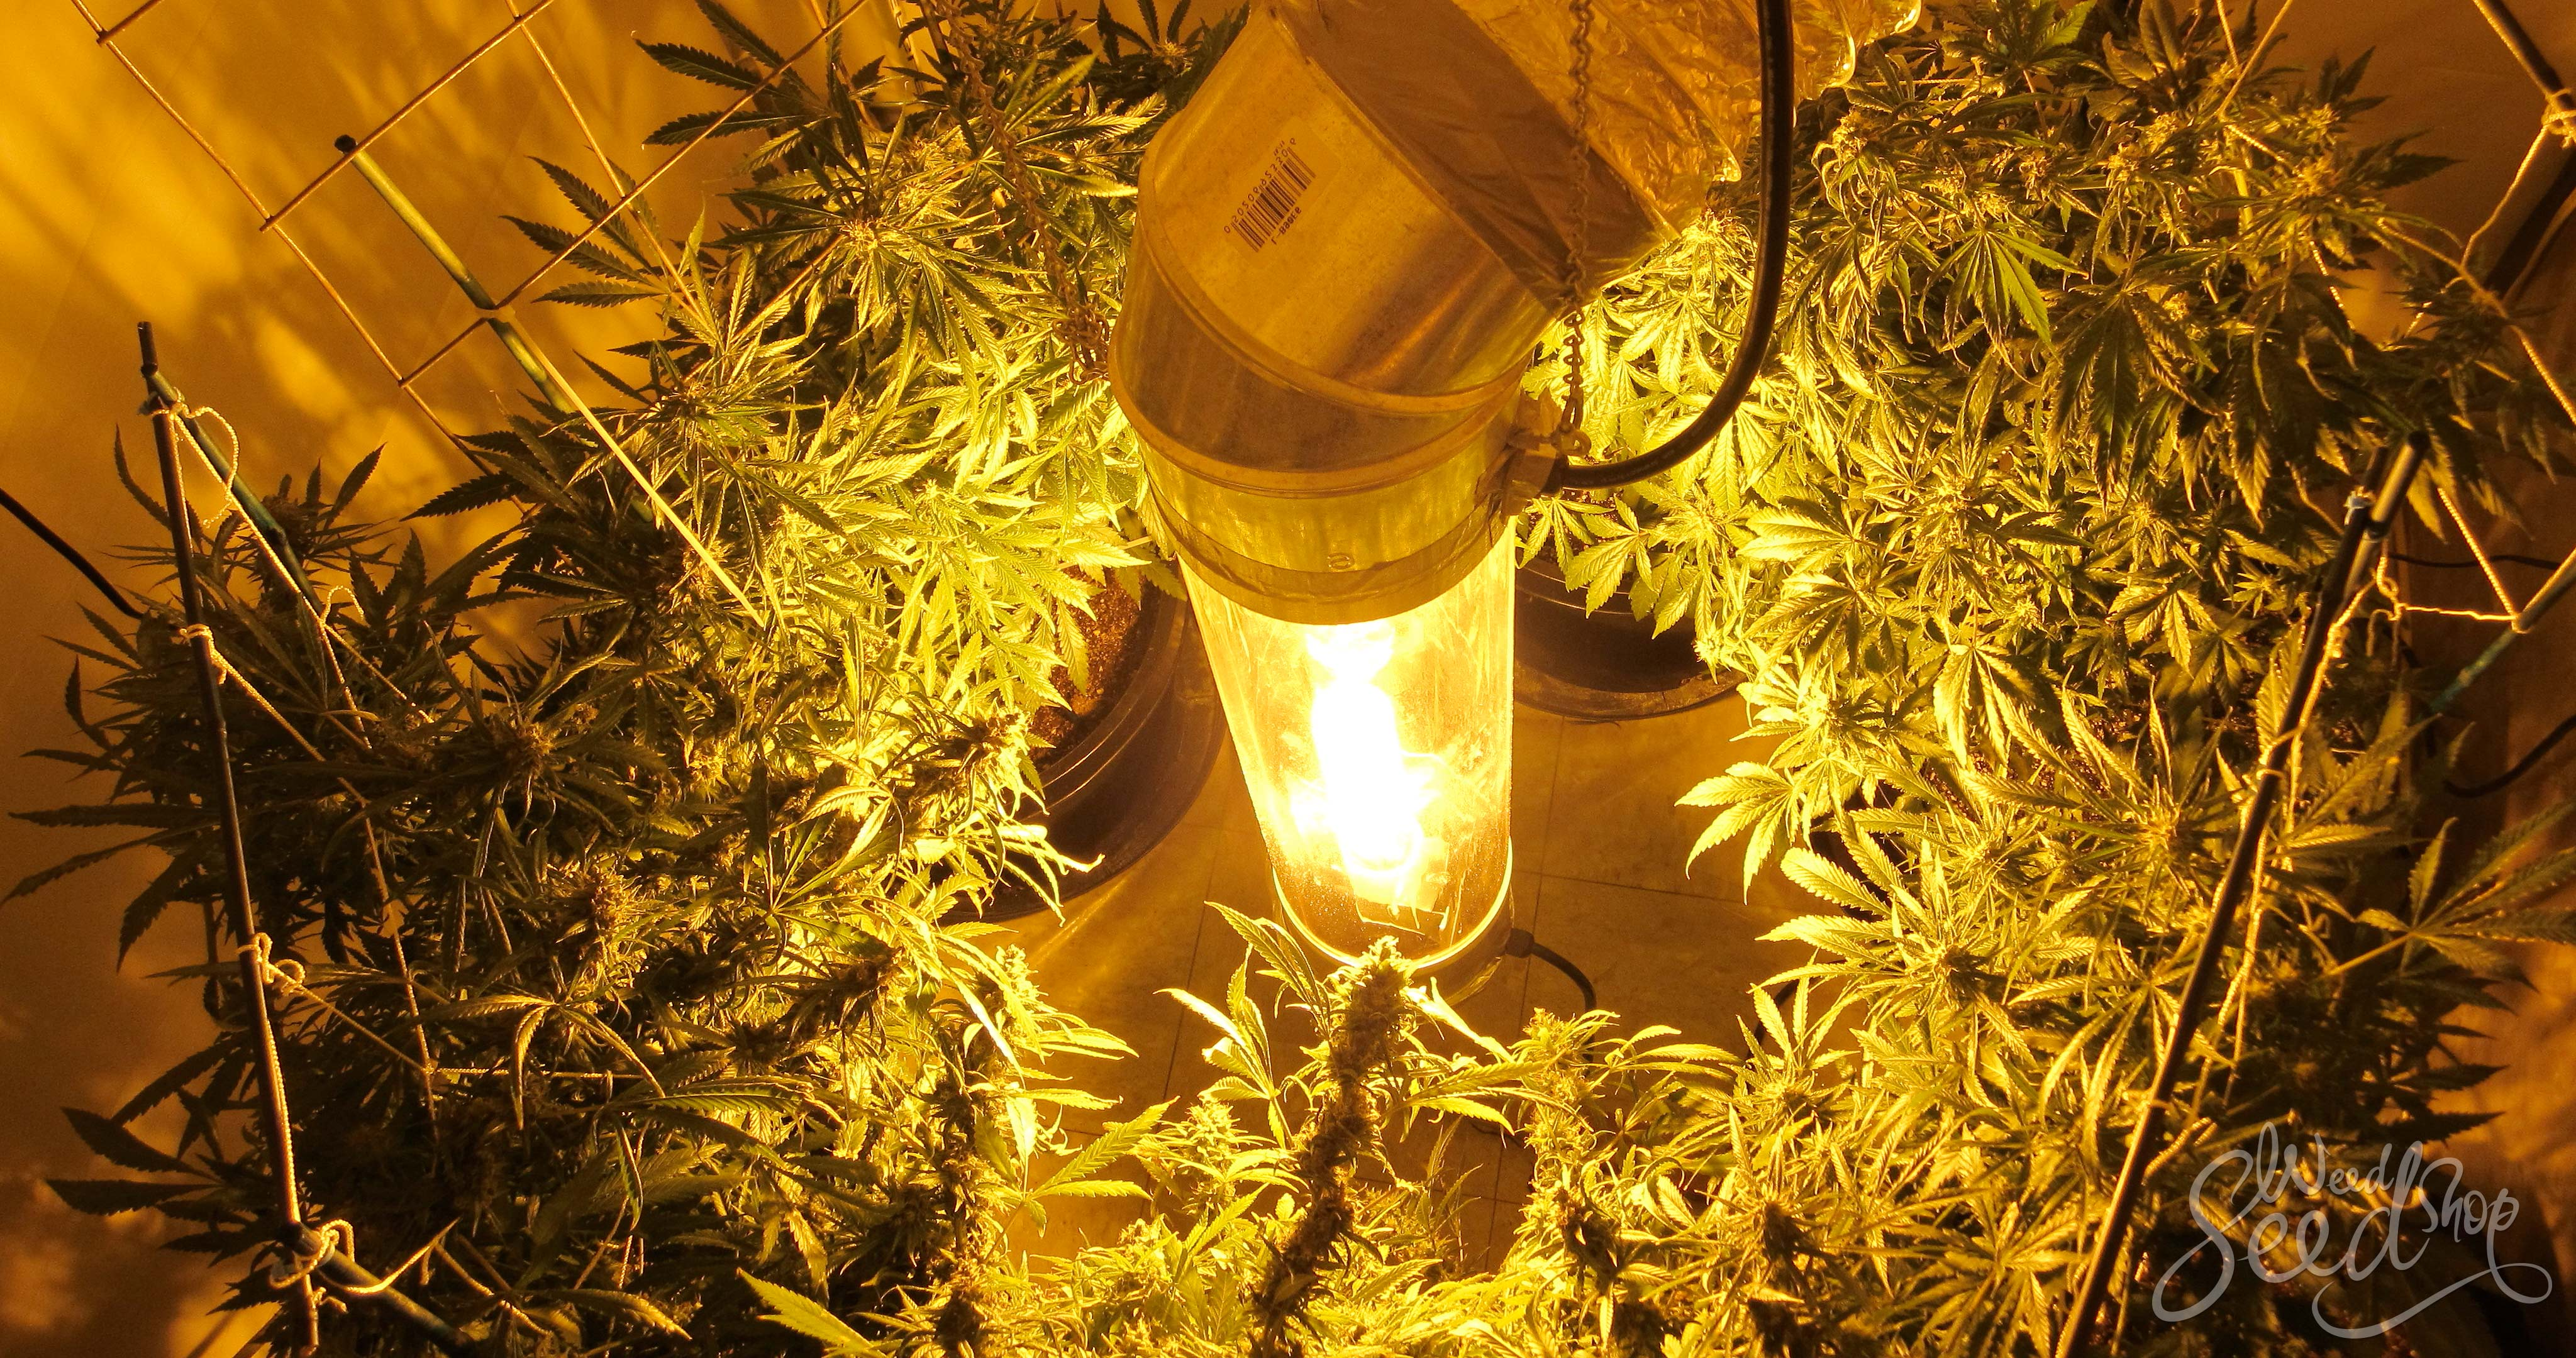 Comment cultiver la marijuana verticalement– Weed Seed Shop